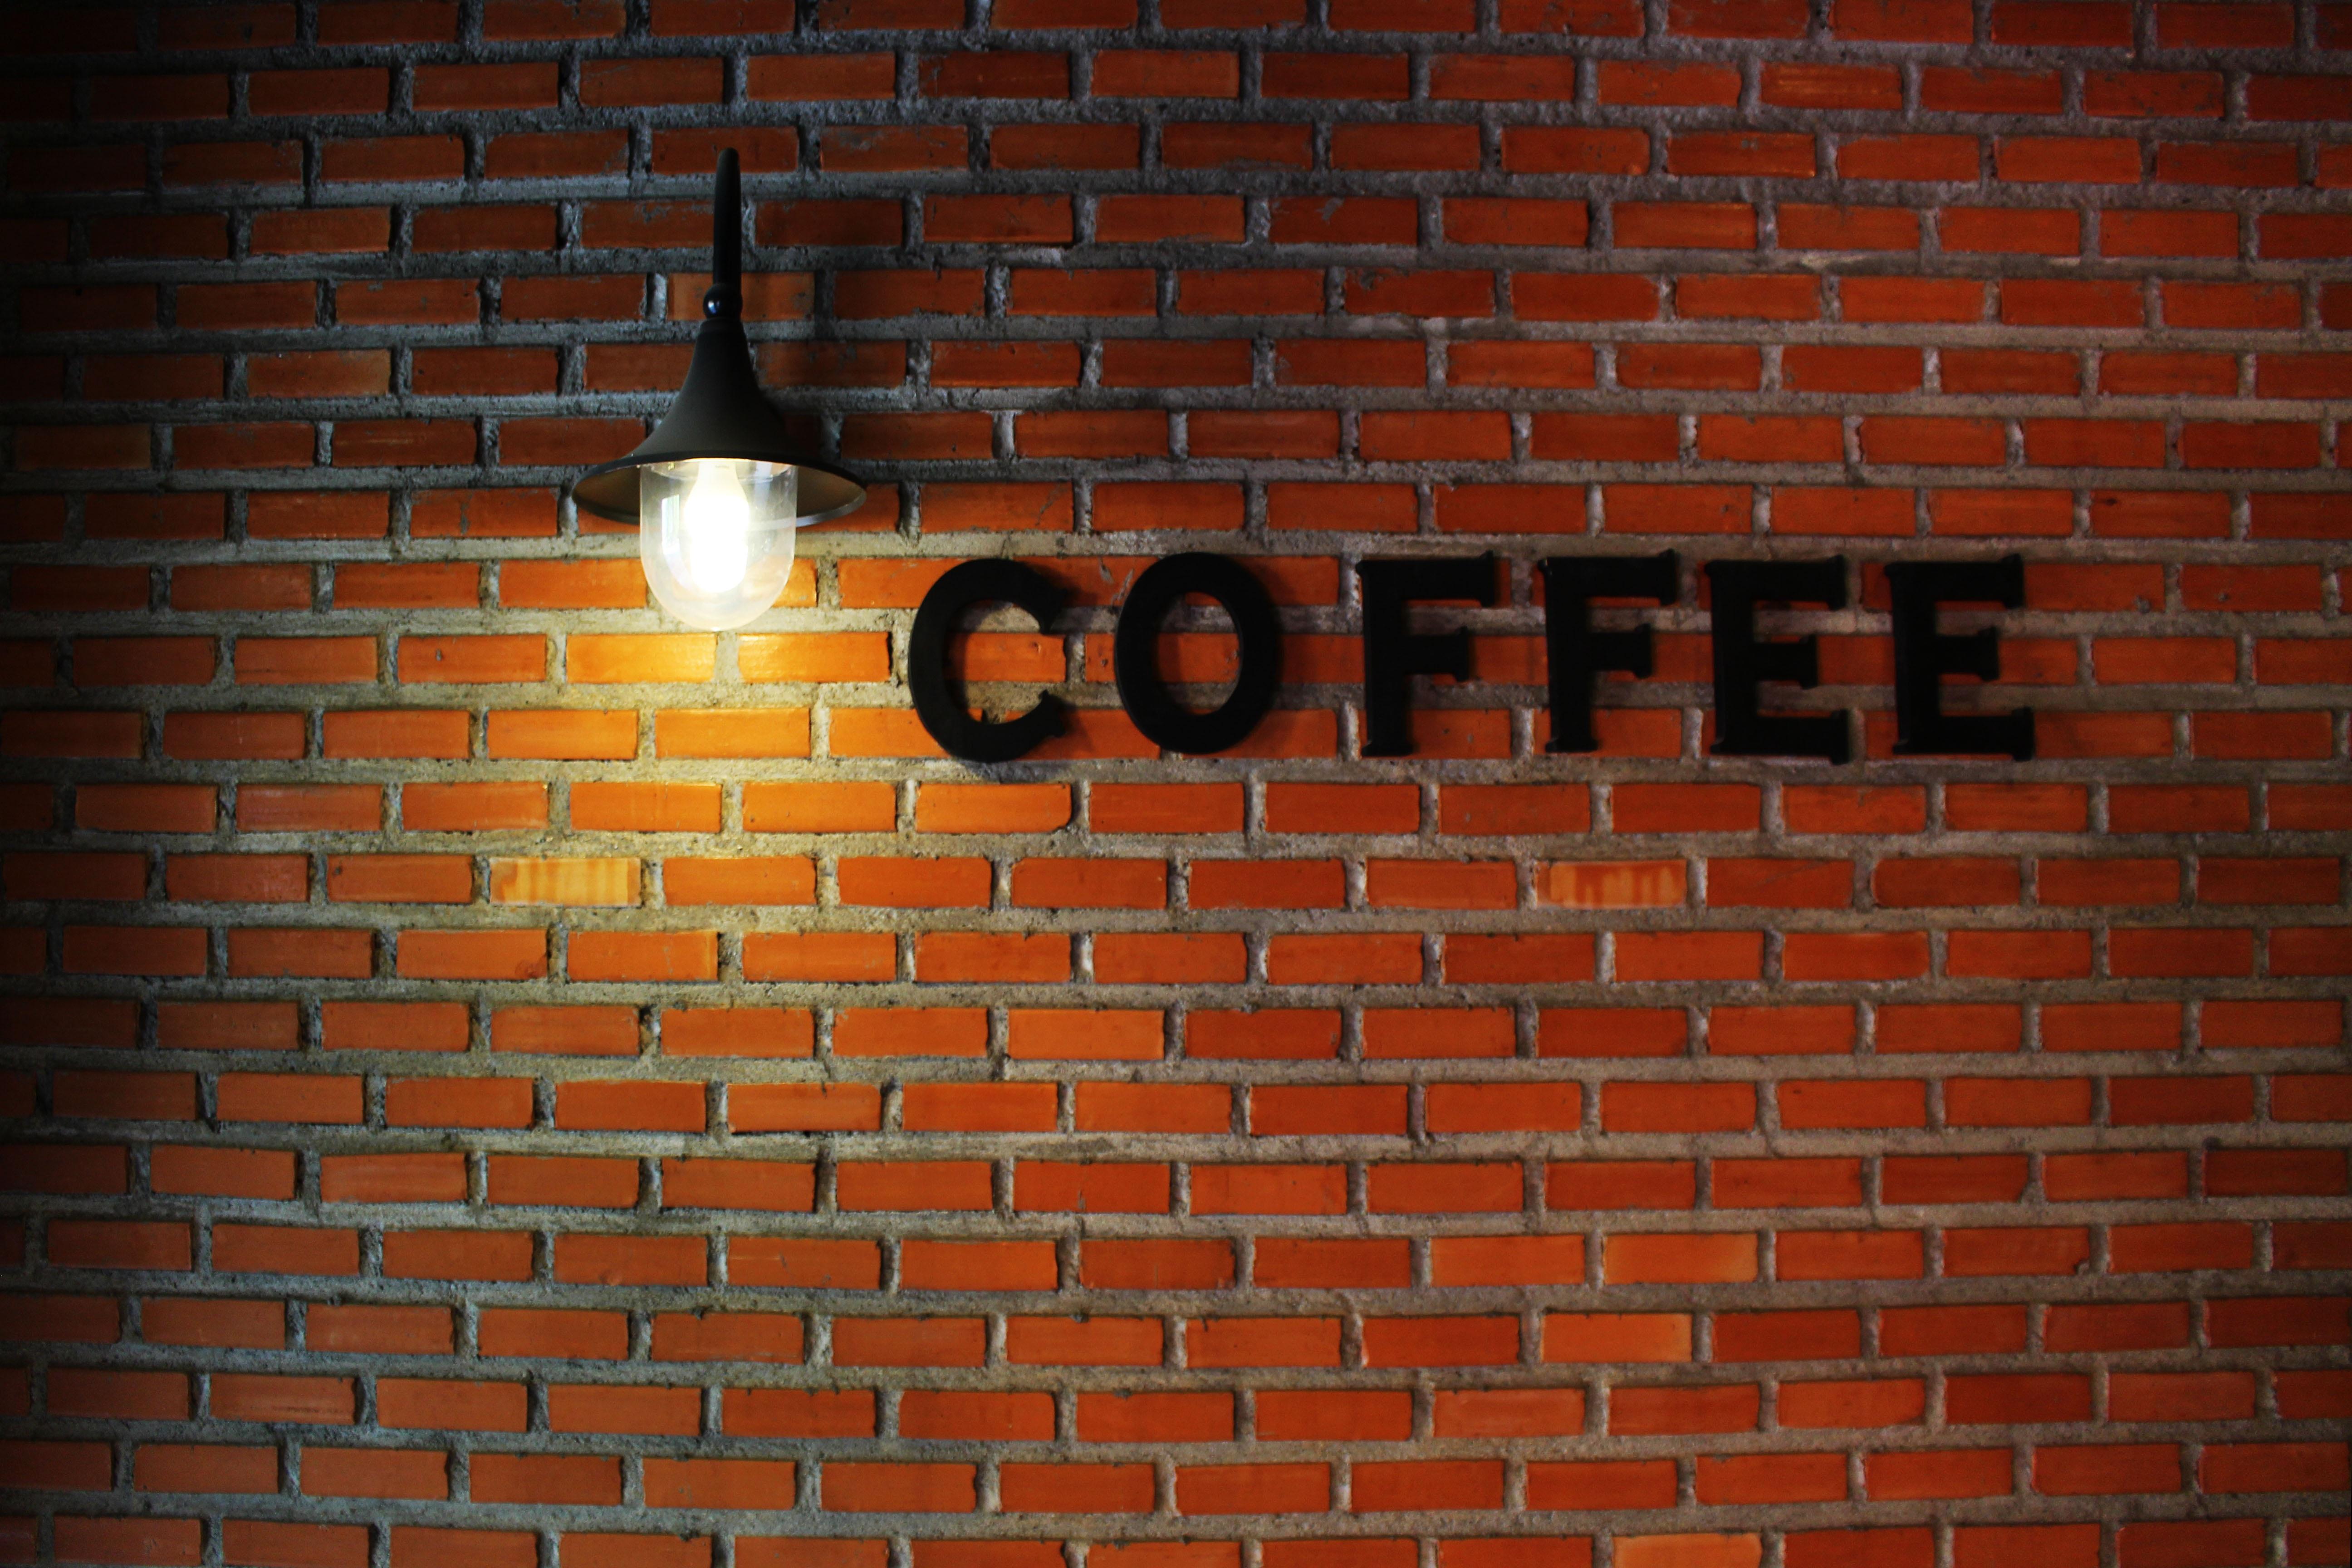 Gambar Kreatif Kafe Kopi Dinding Tanda Pola Merah